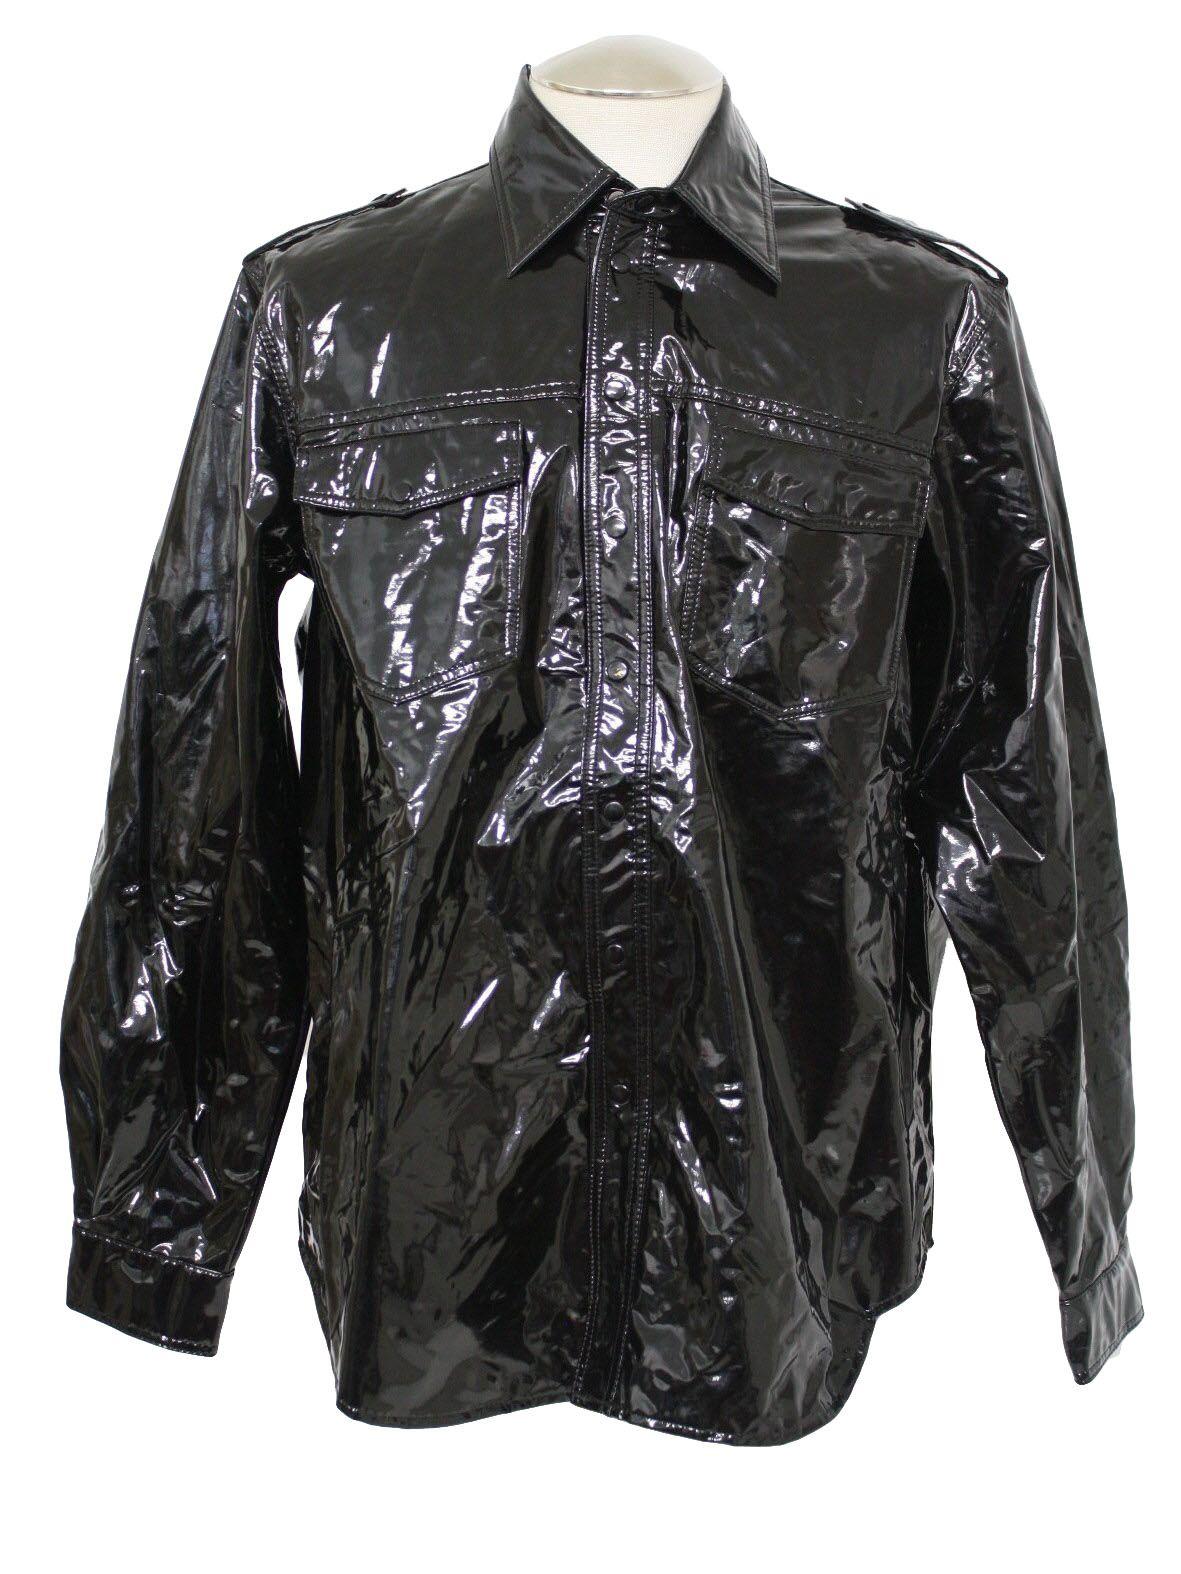 Black and white 80s jacket